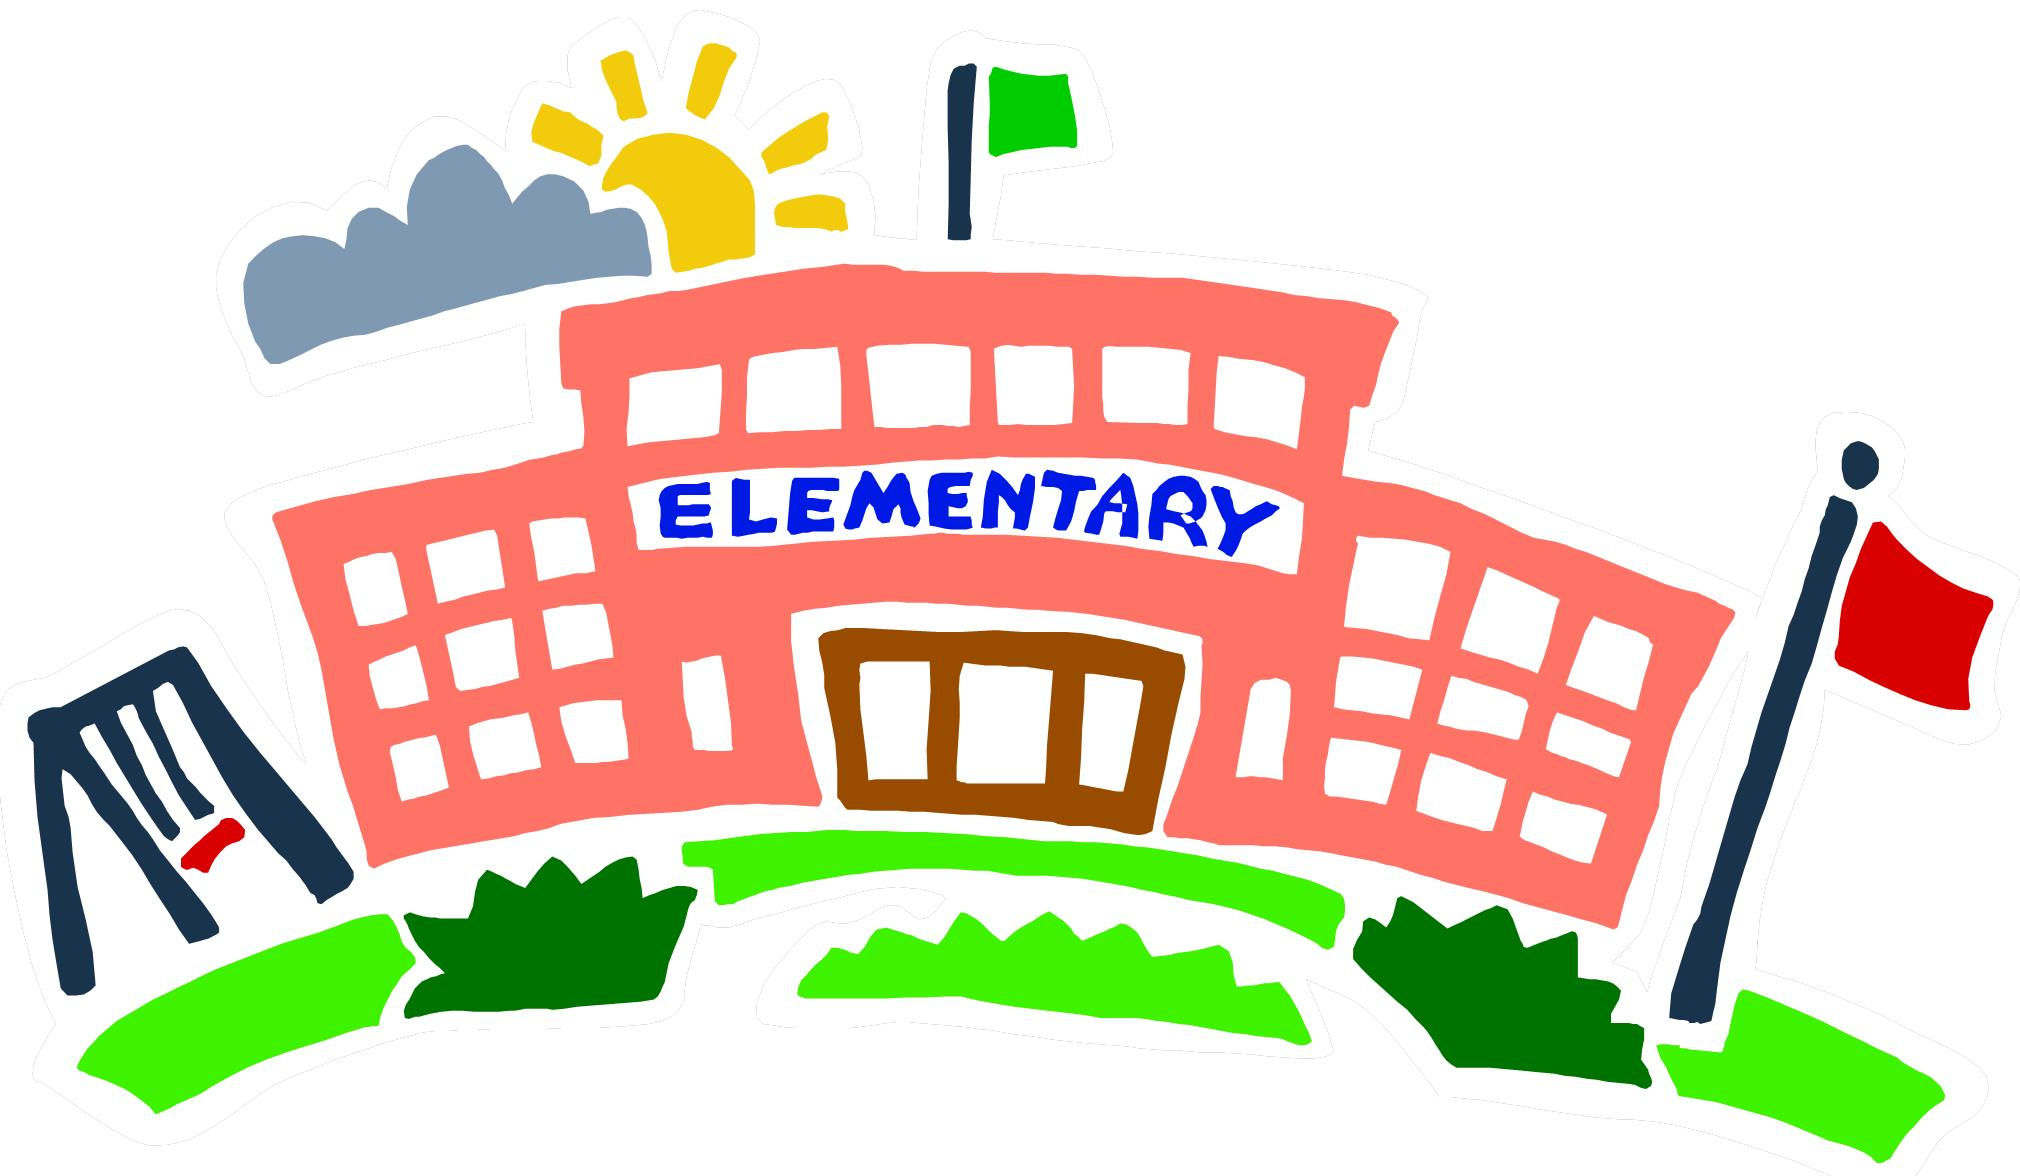 2020x1176 School Clipart Many Interesting Cliparts